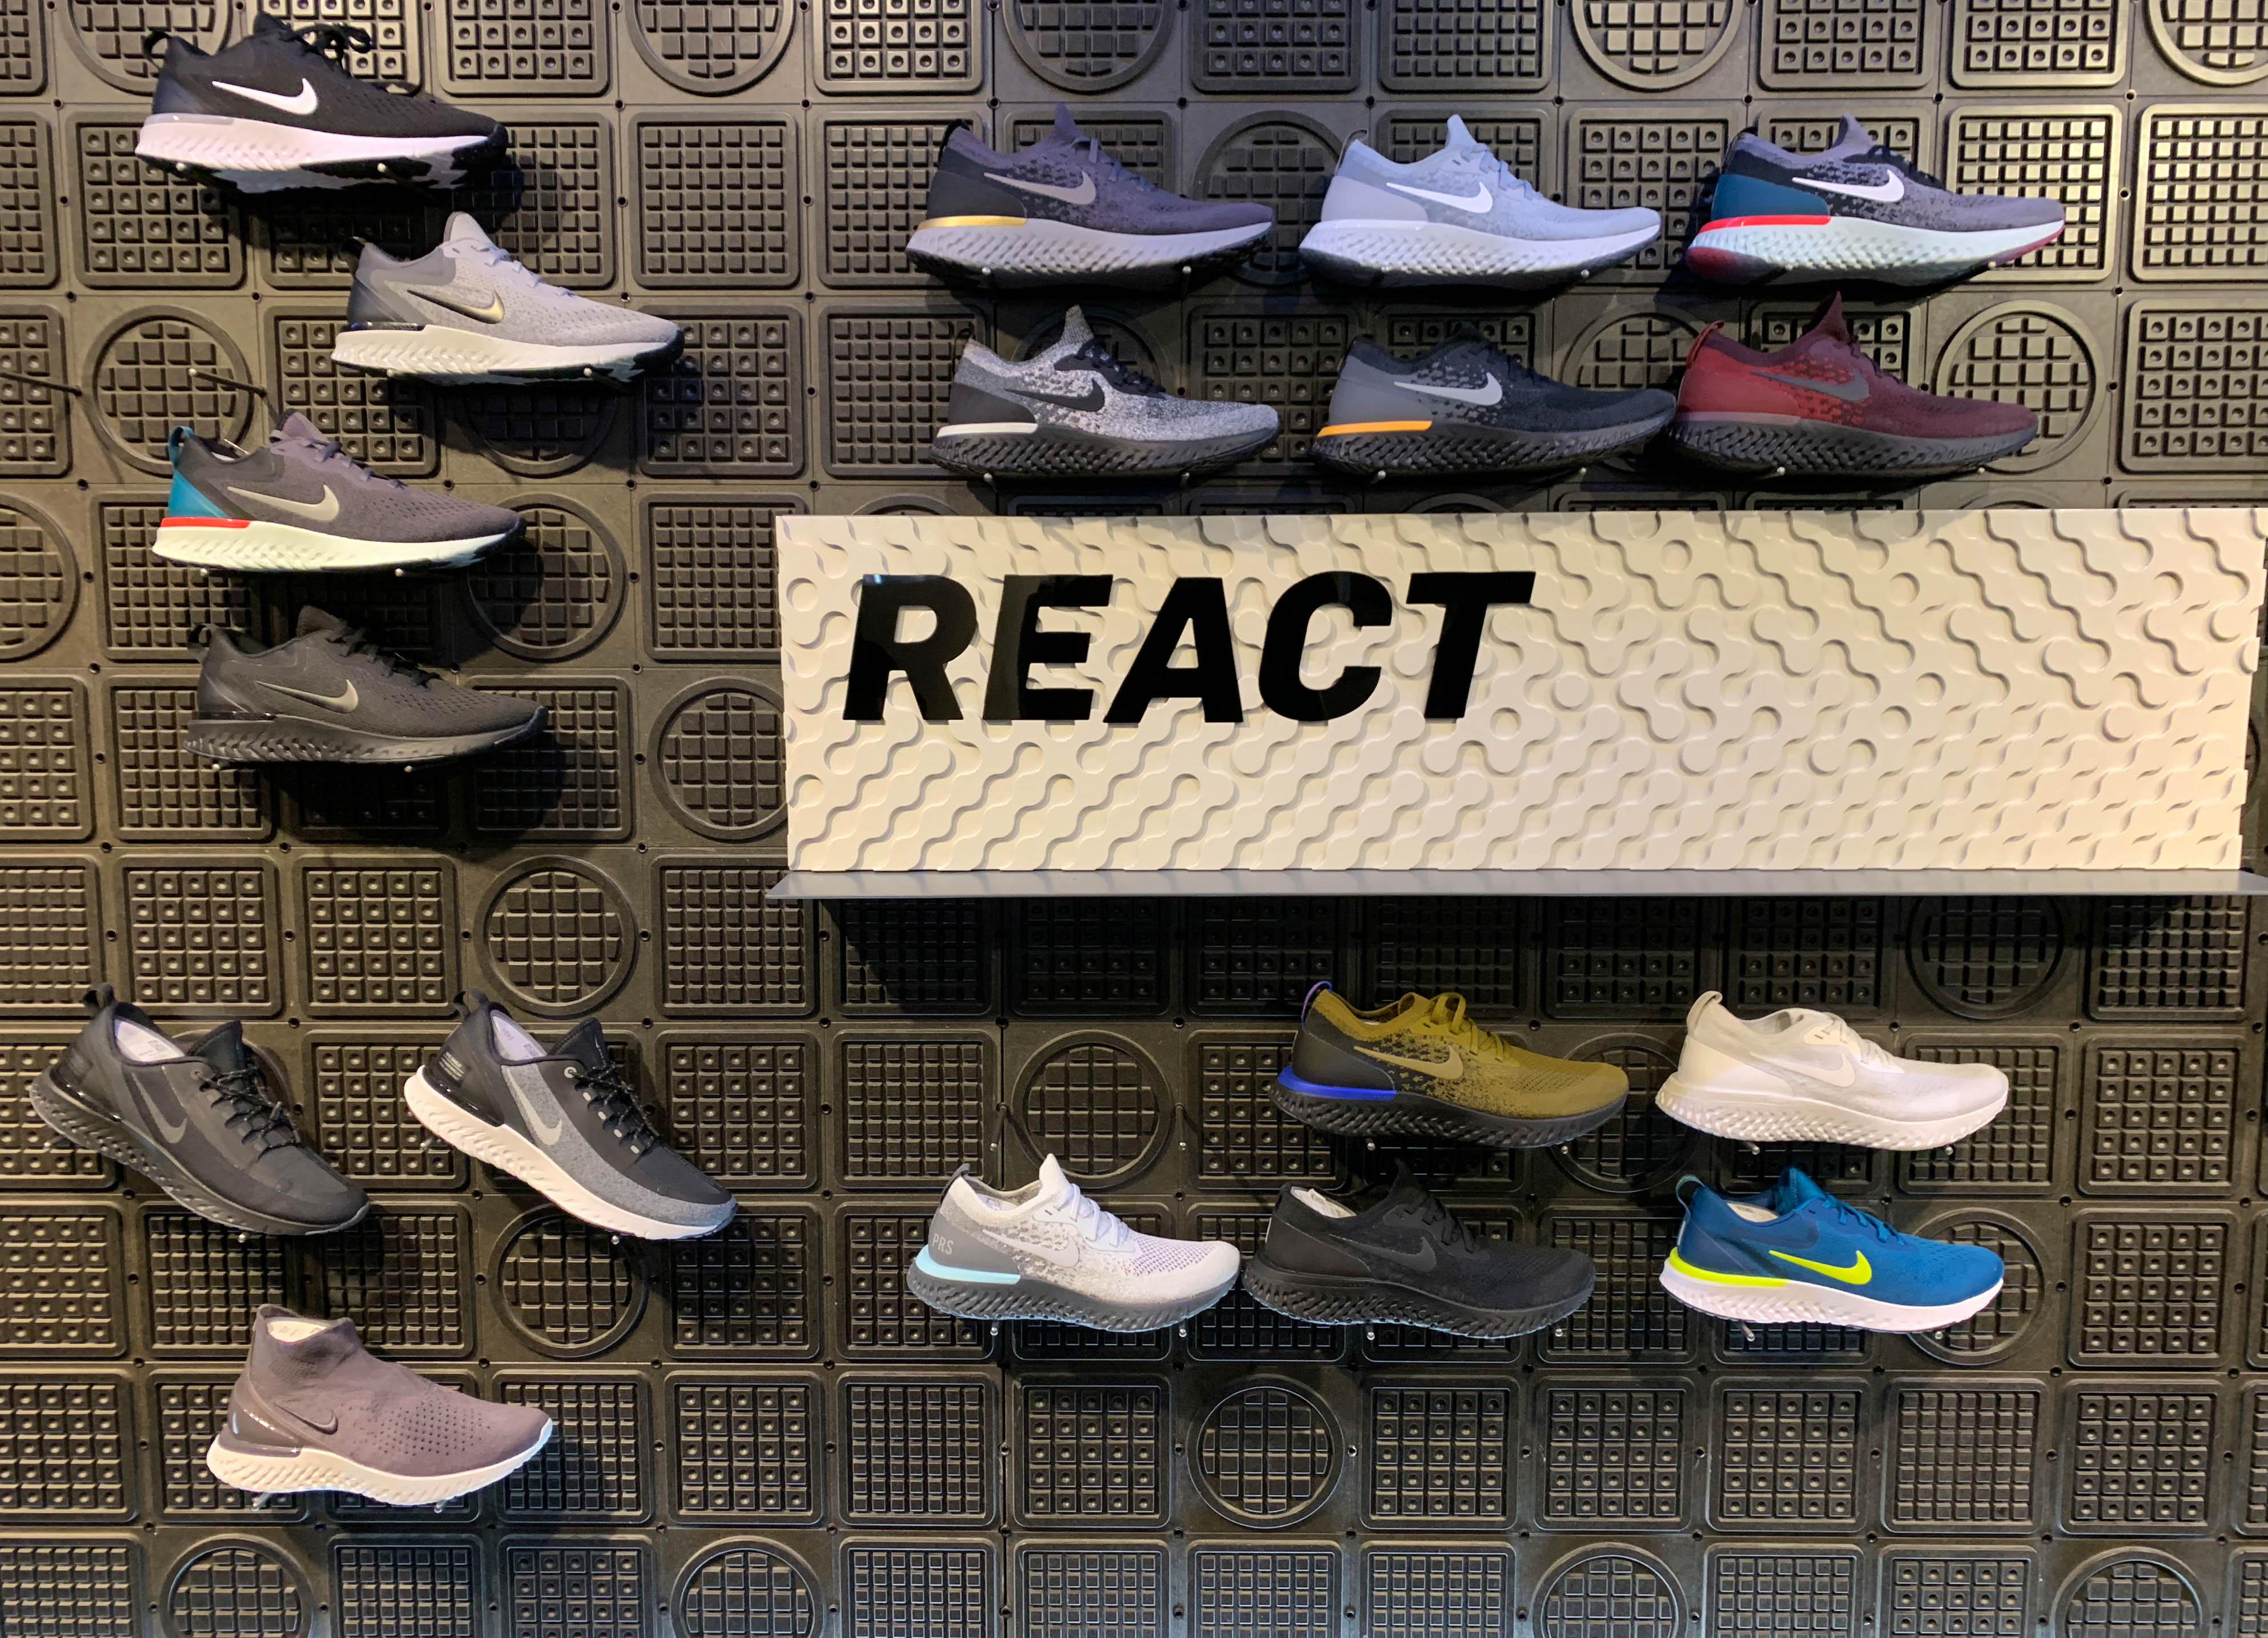 Nike React Running shoe